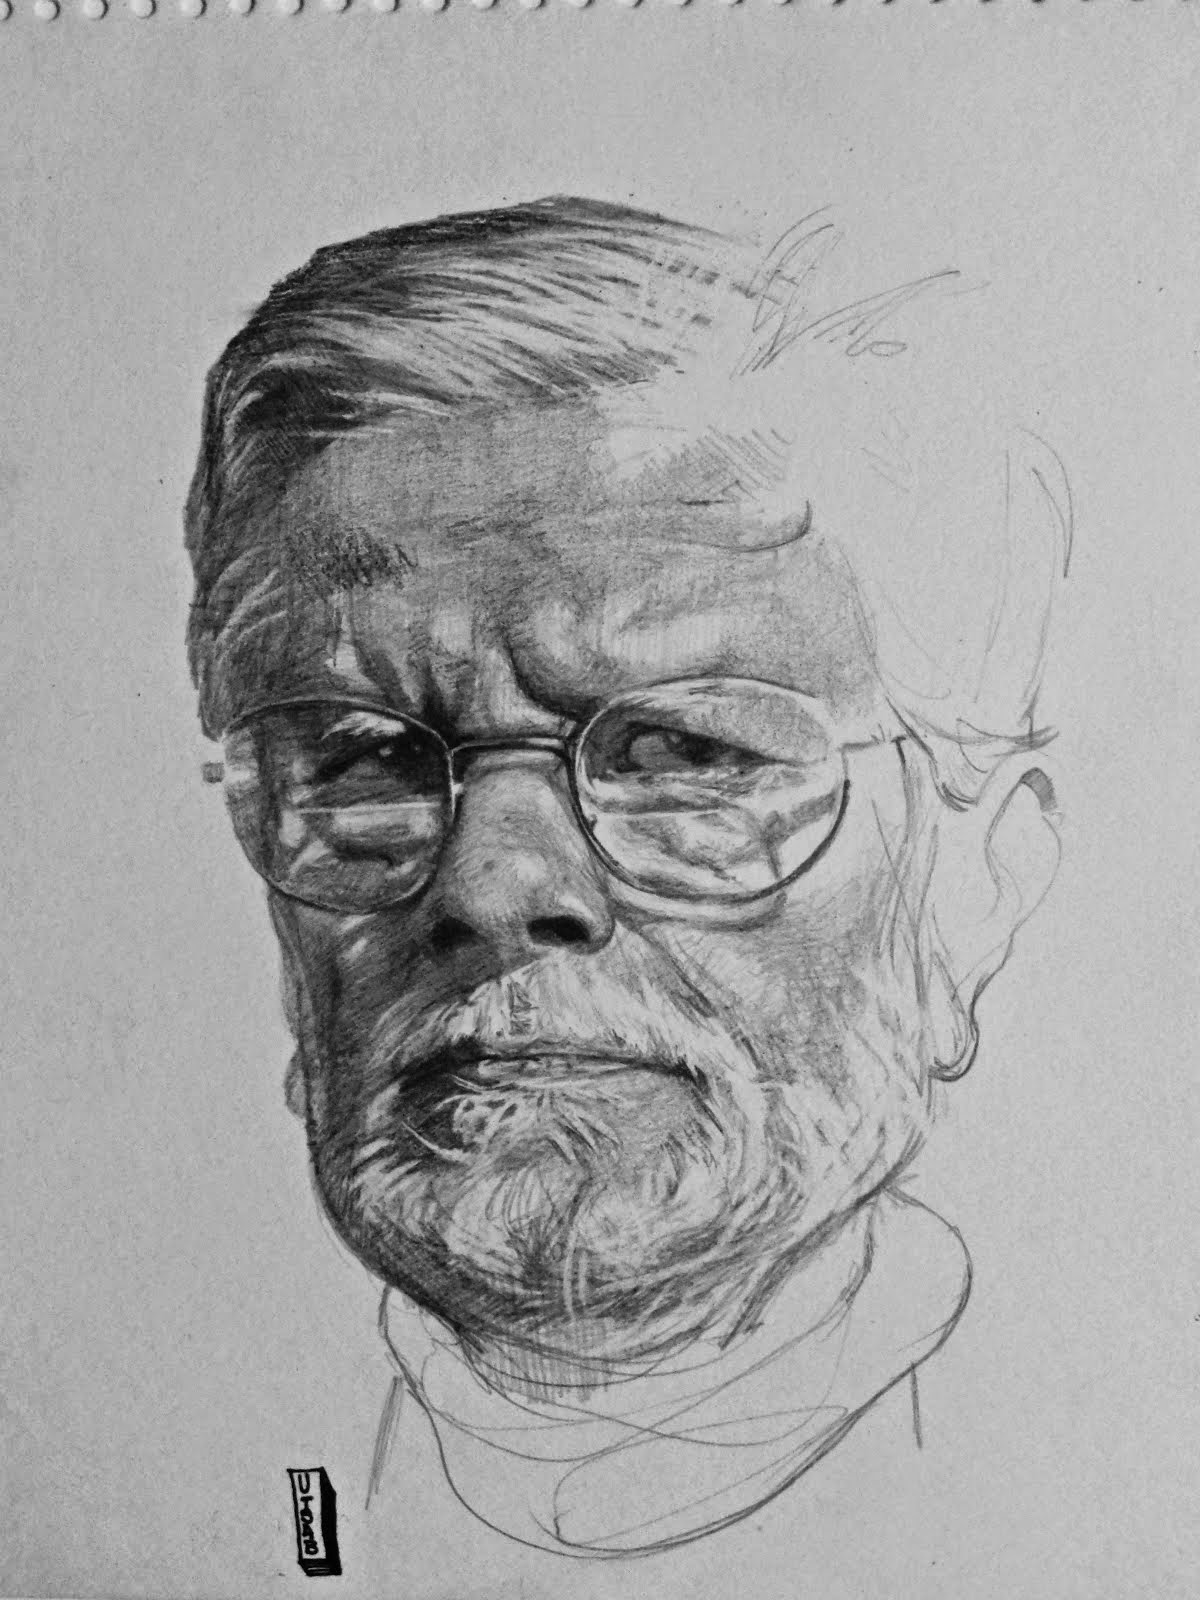 Malay Roychoudhury drawn by Utsab Chatterjee